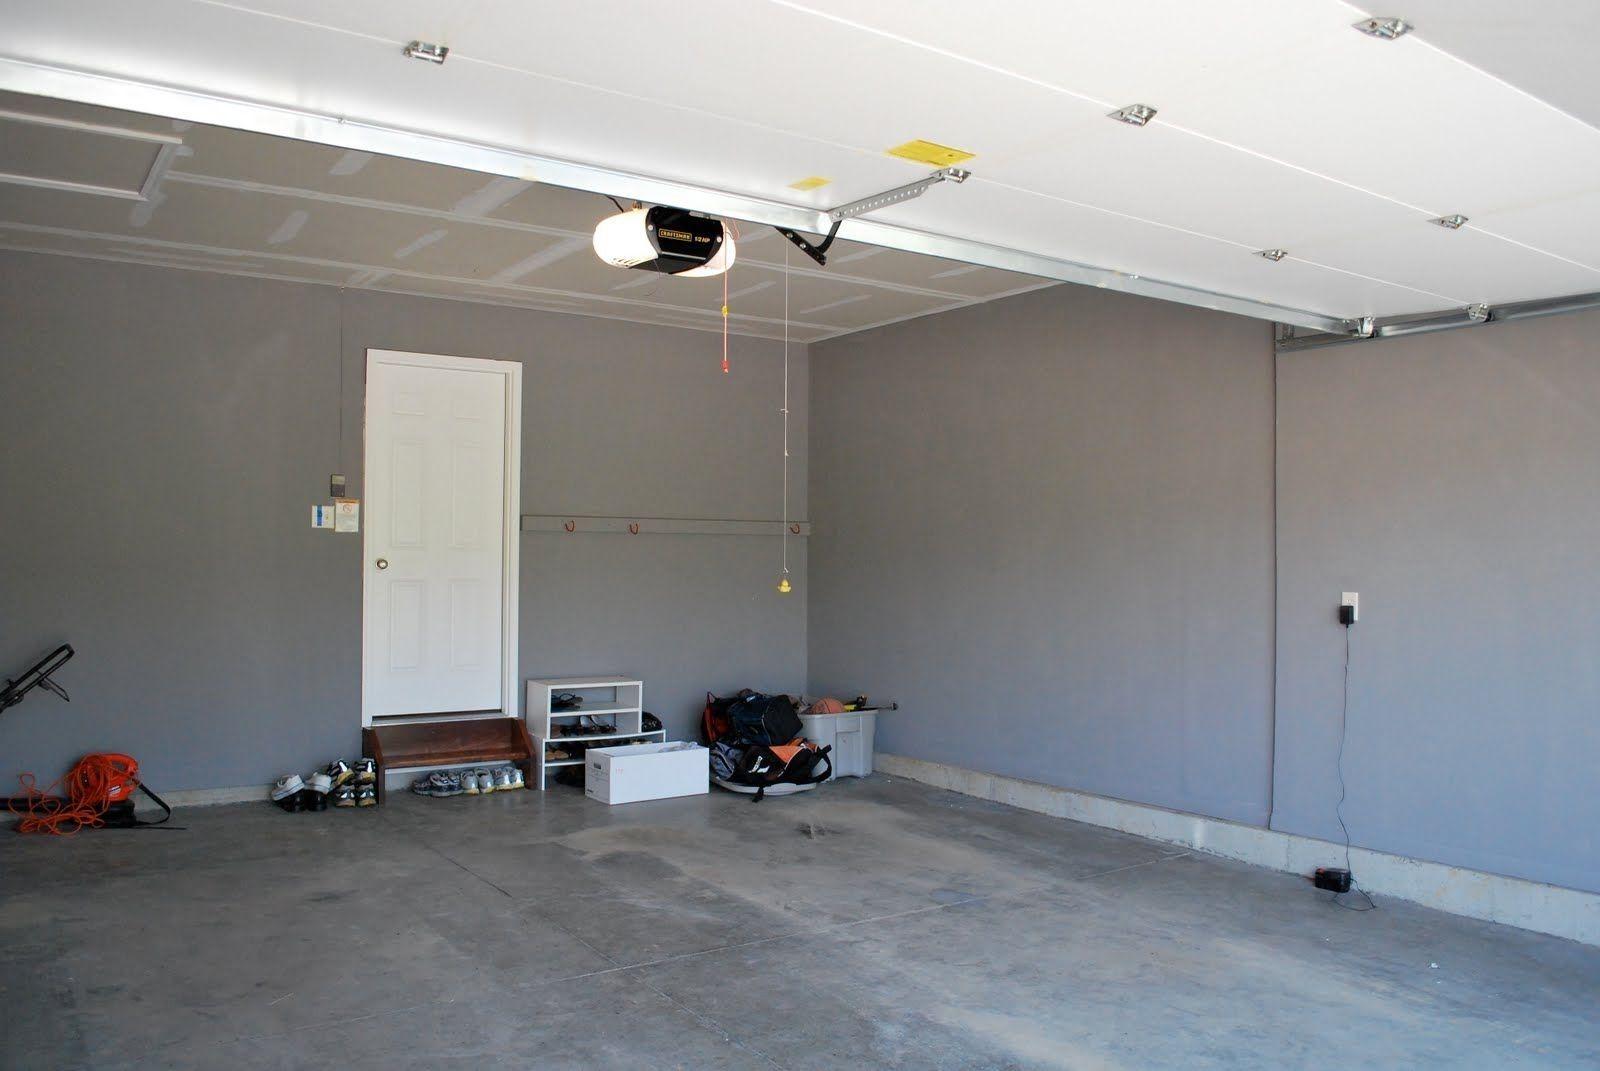 Beautiful Garage Wall Paint Ideas CN16l2 | Painted garage walls, Garage paint colors, Garage paint